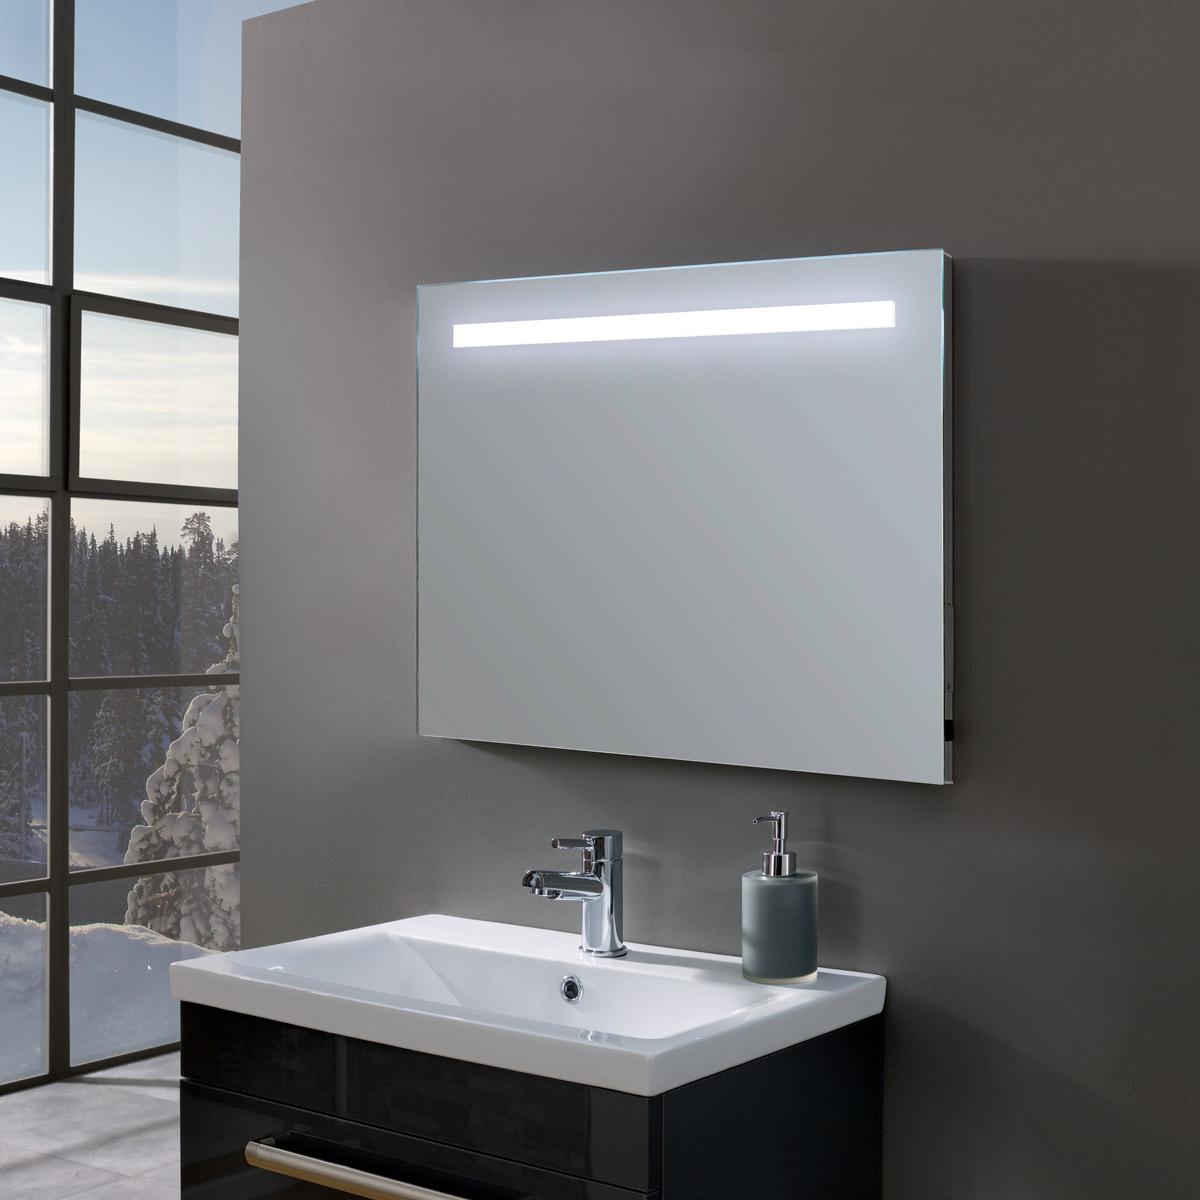 Battery Powered Led Illuminated Mirror, Bathroom Battery Light